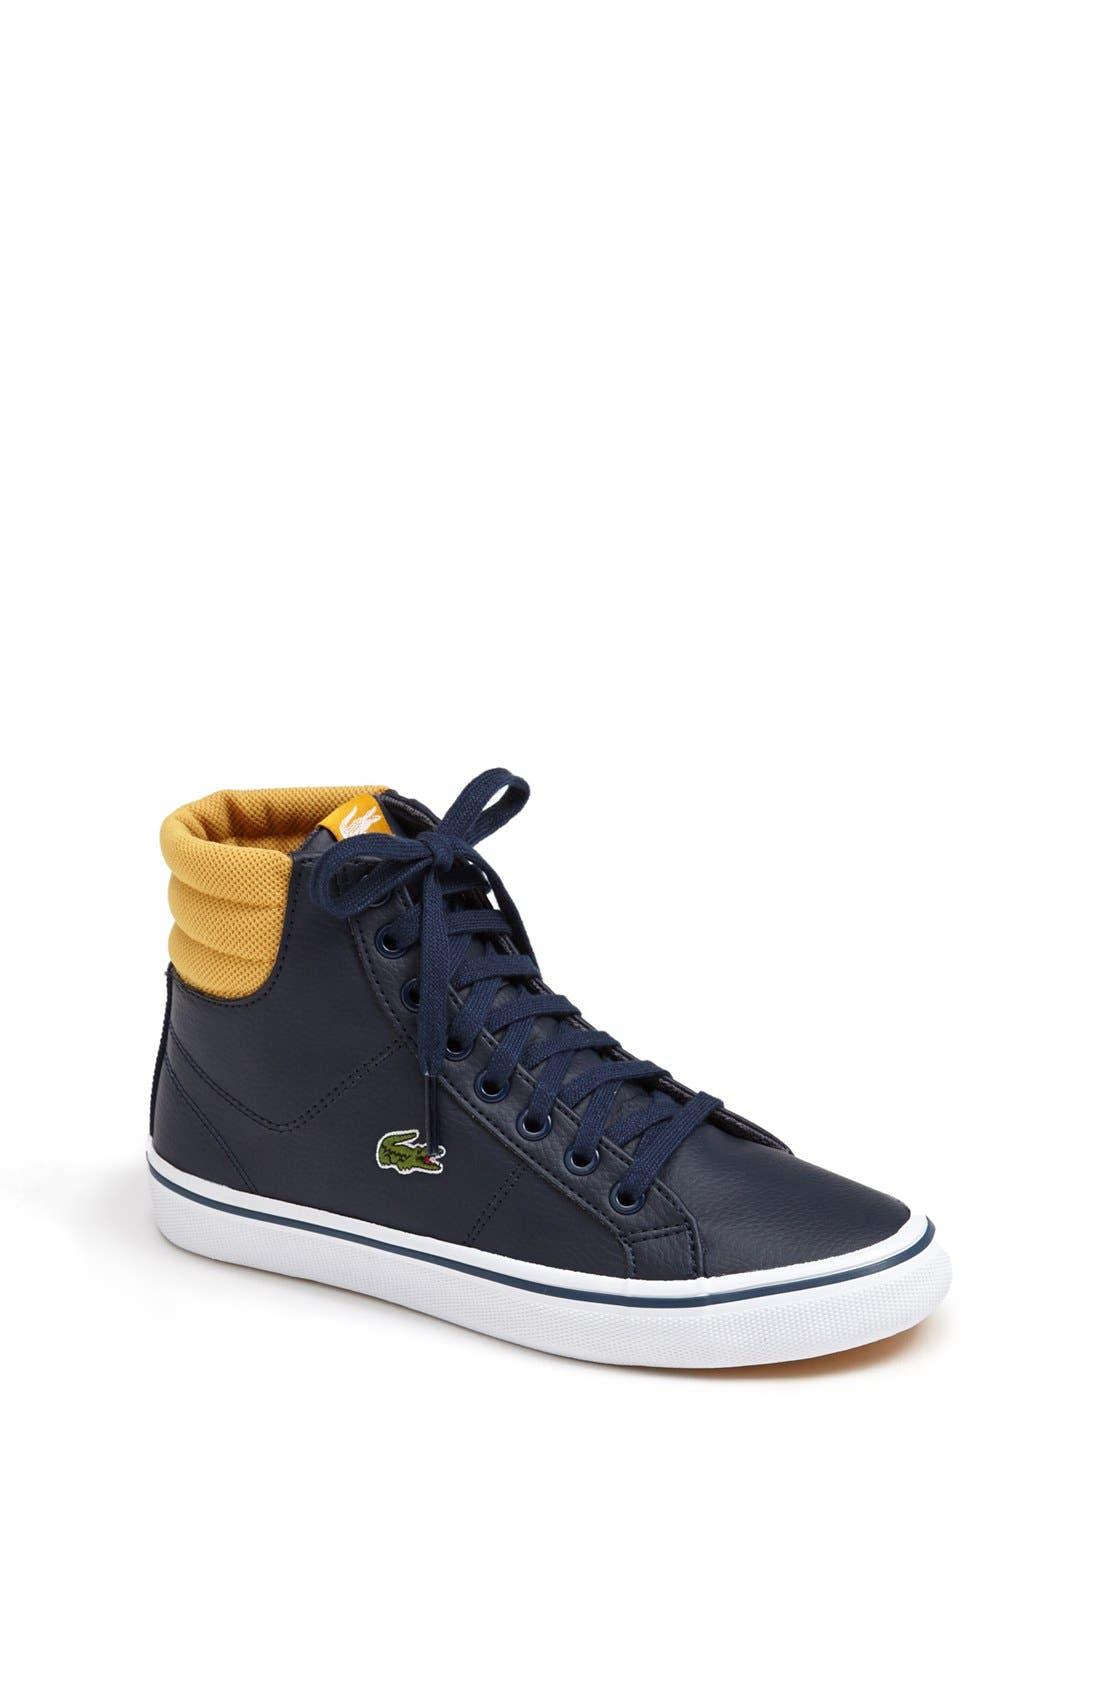 Main Image - Lacoste 'Marcel' Sneaker (Baby, Walker, Toddler, Little Kid & Big Kid)